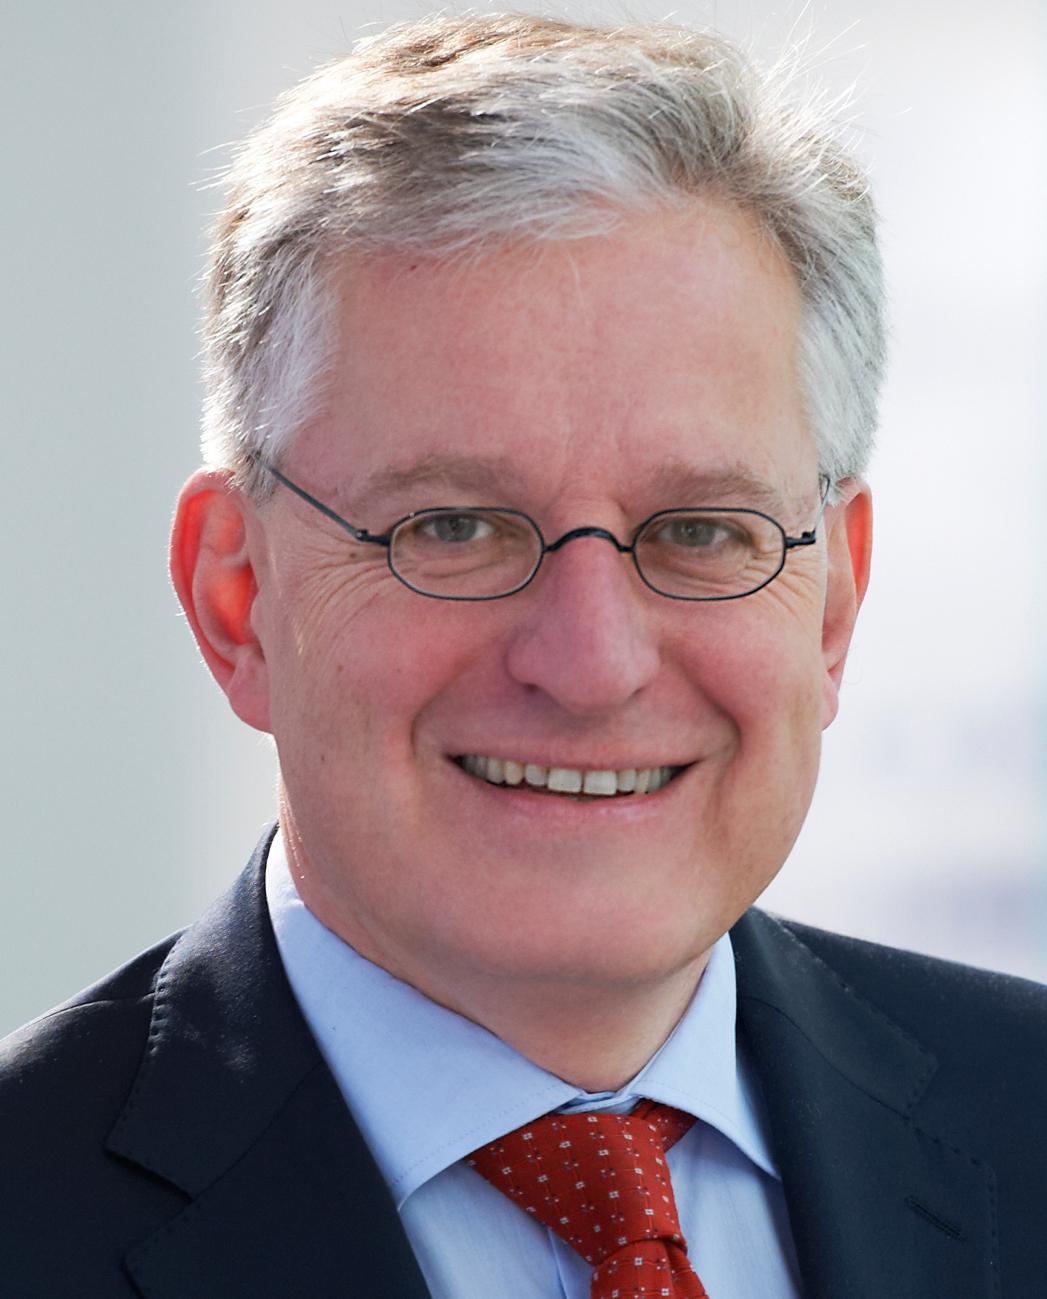 Dr. Lorenz Zwingmann, Knorr-Bremse AG